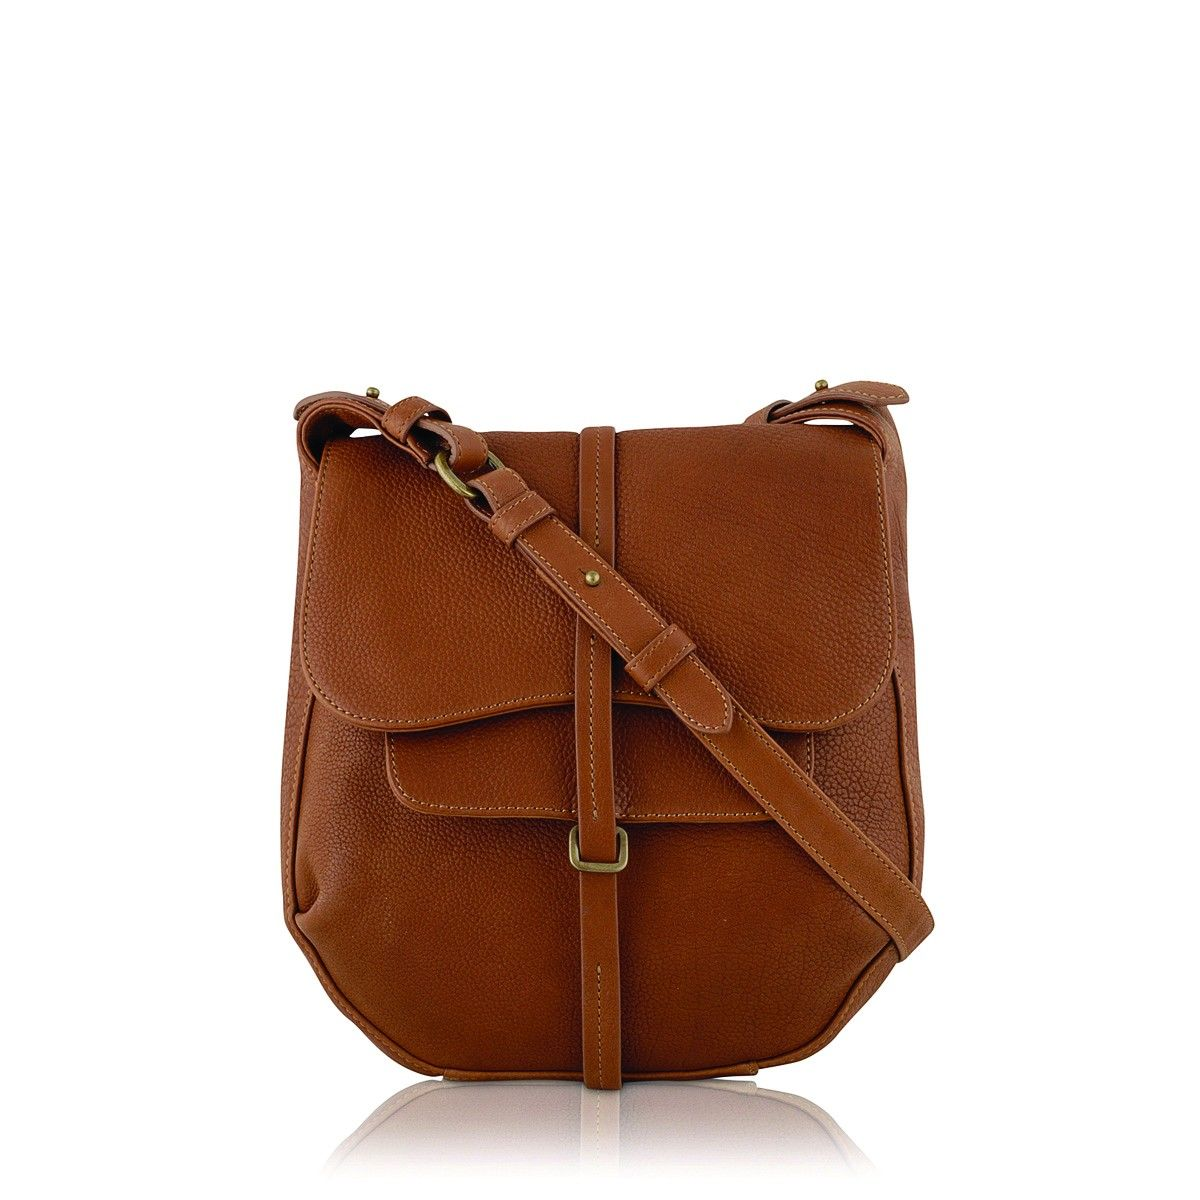 Radley London Grosvenor Medium Cross Body Bag Tan brown supple leather crossbody  handbag bag European 6c30f34583f69